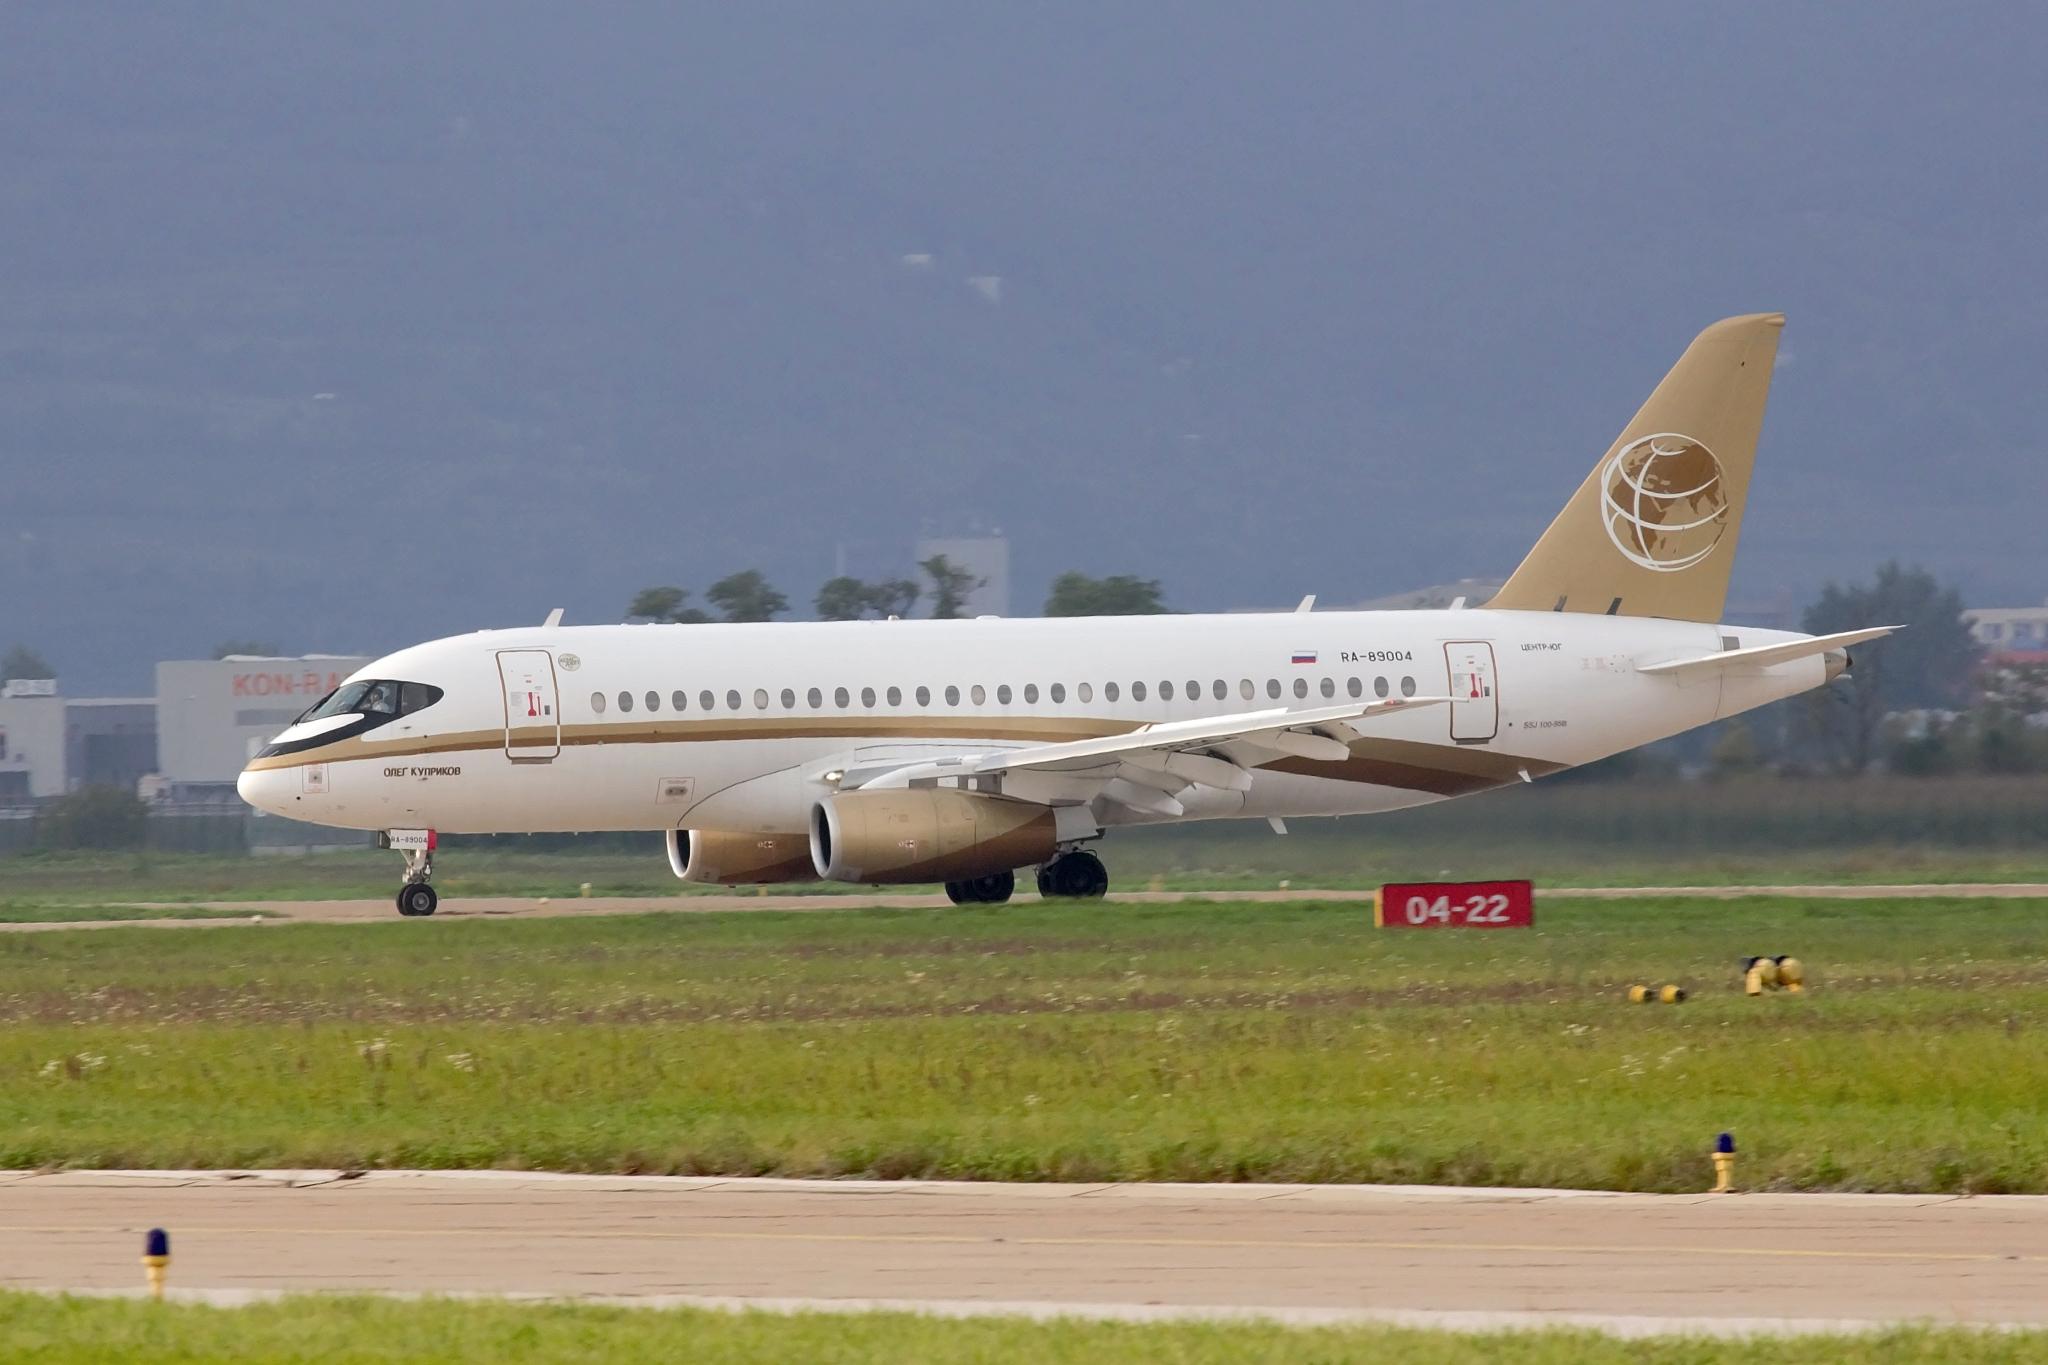 Center-South Sukhoi Superjet 100-95B; RA-89004